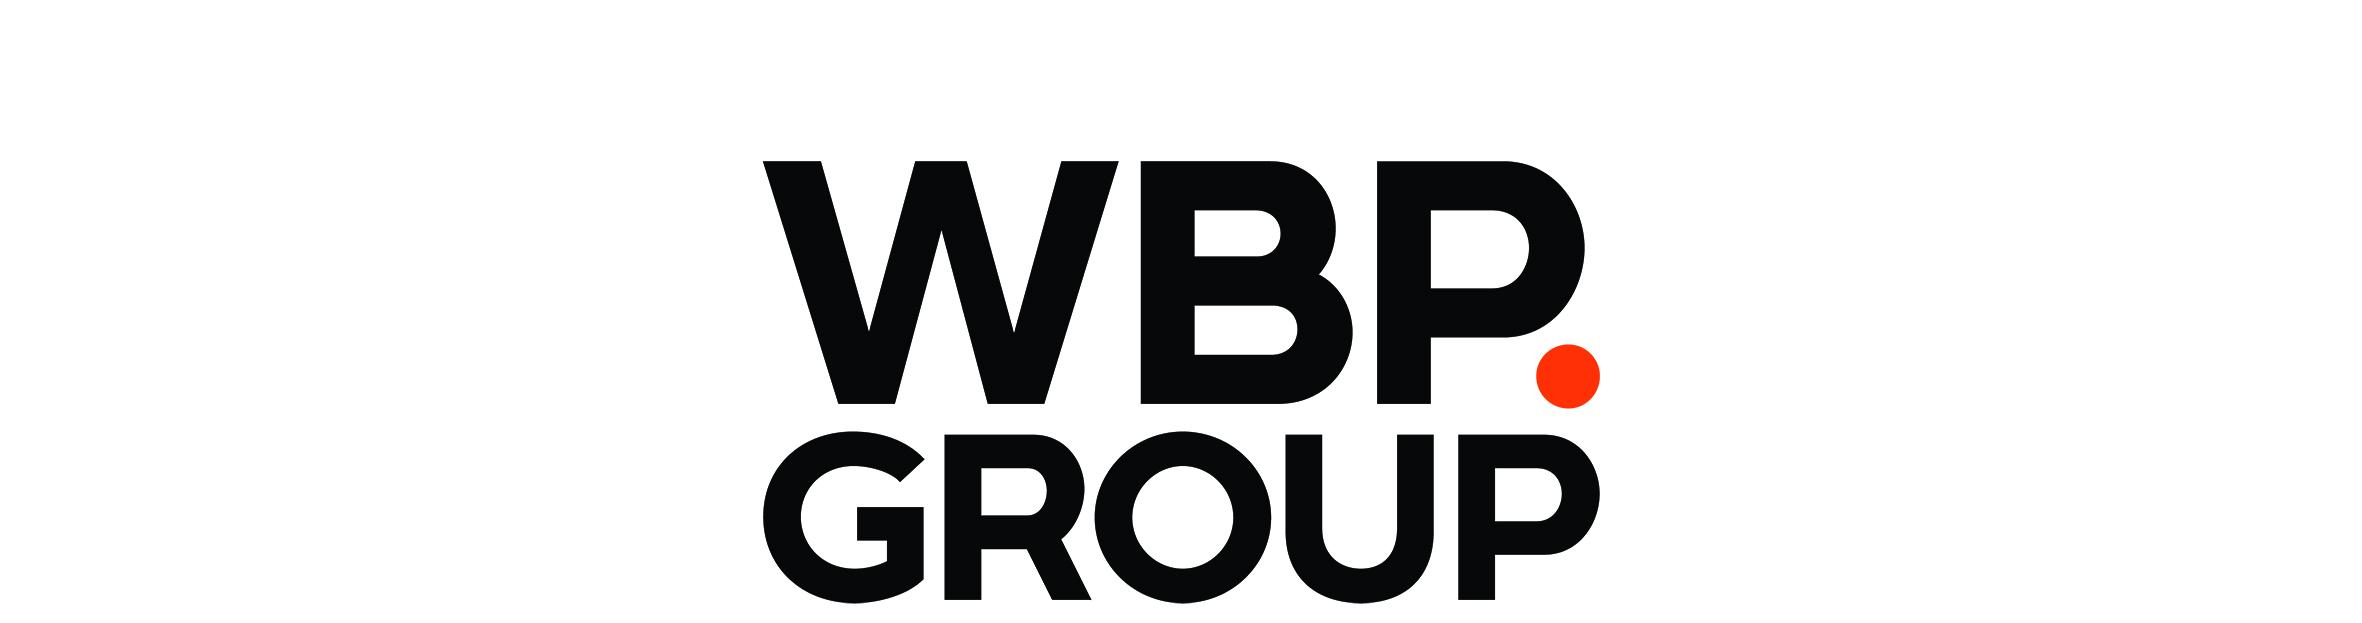 WBP Group_Logo.jpg